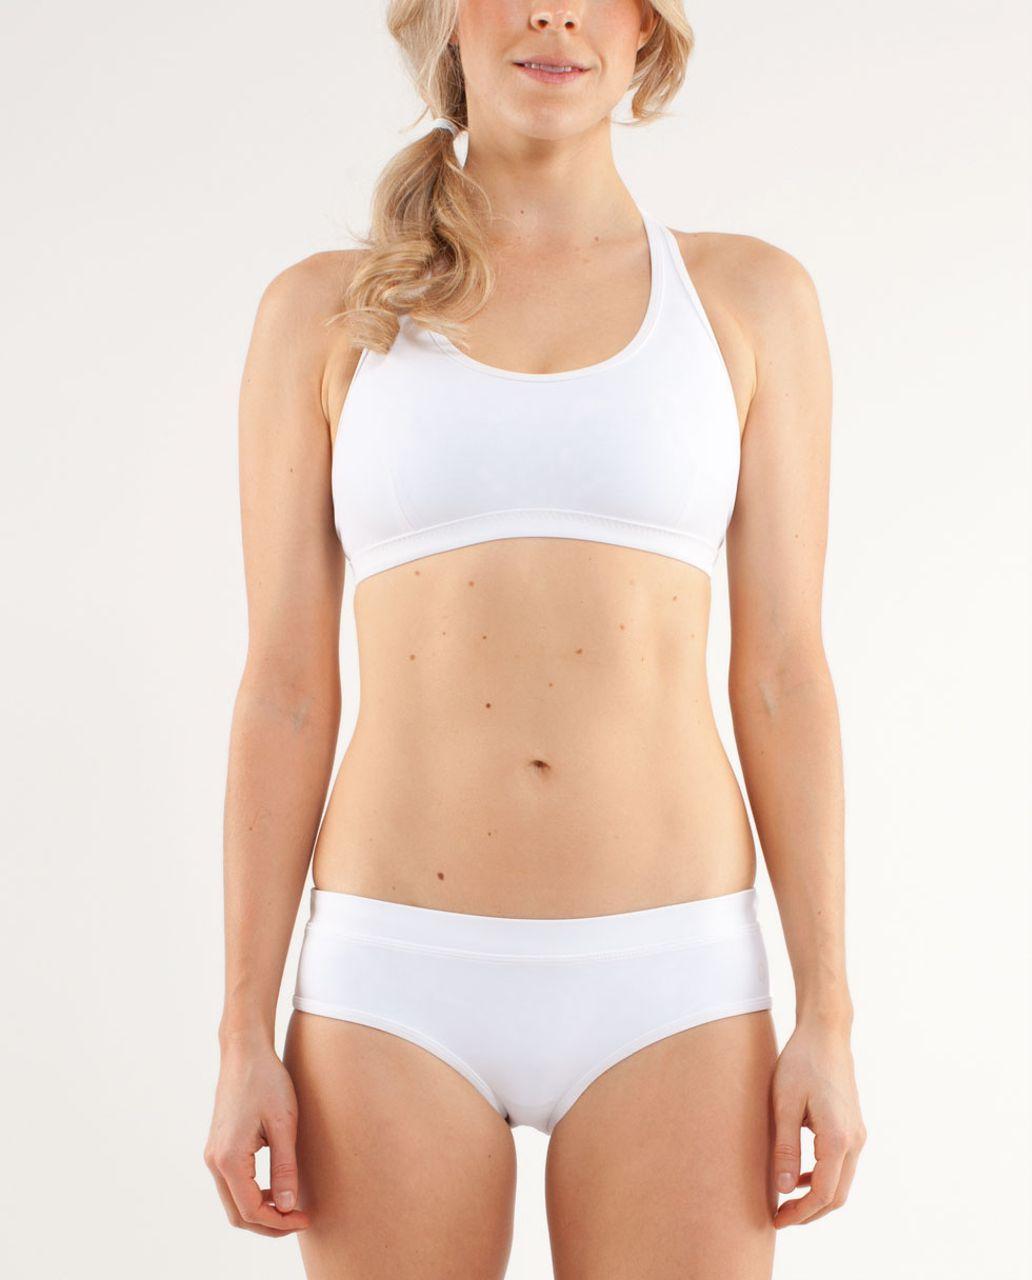 Lululemon Heatwave Swim Racer Top - White / Beachy Floral White Porcelaine